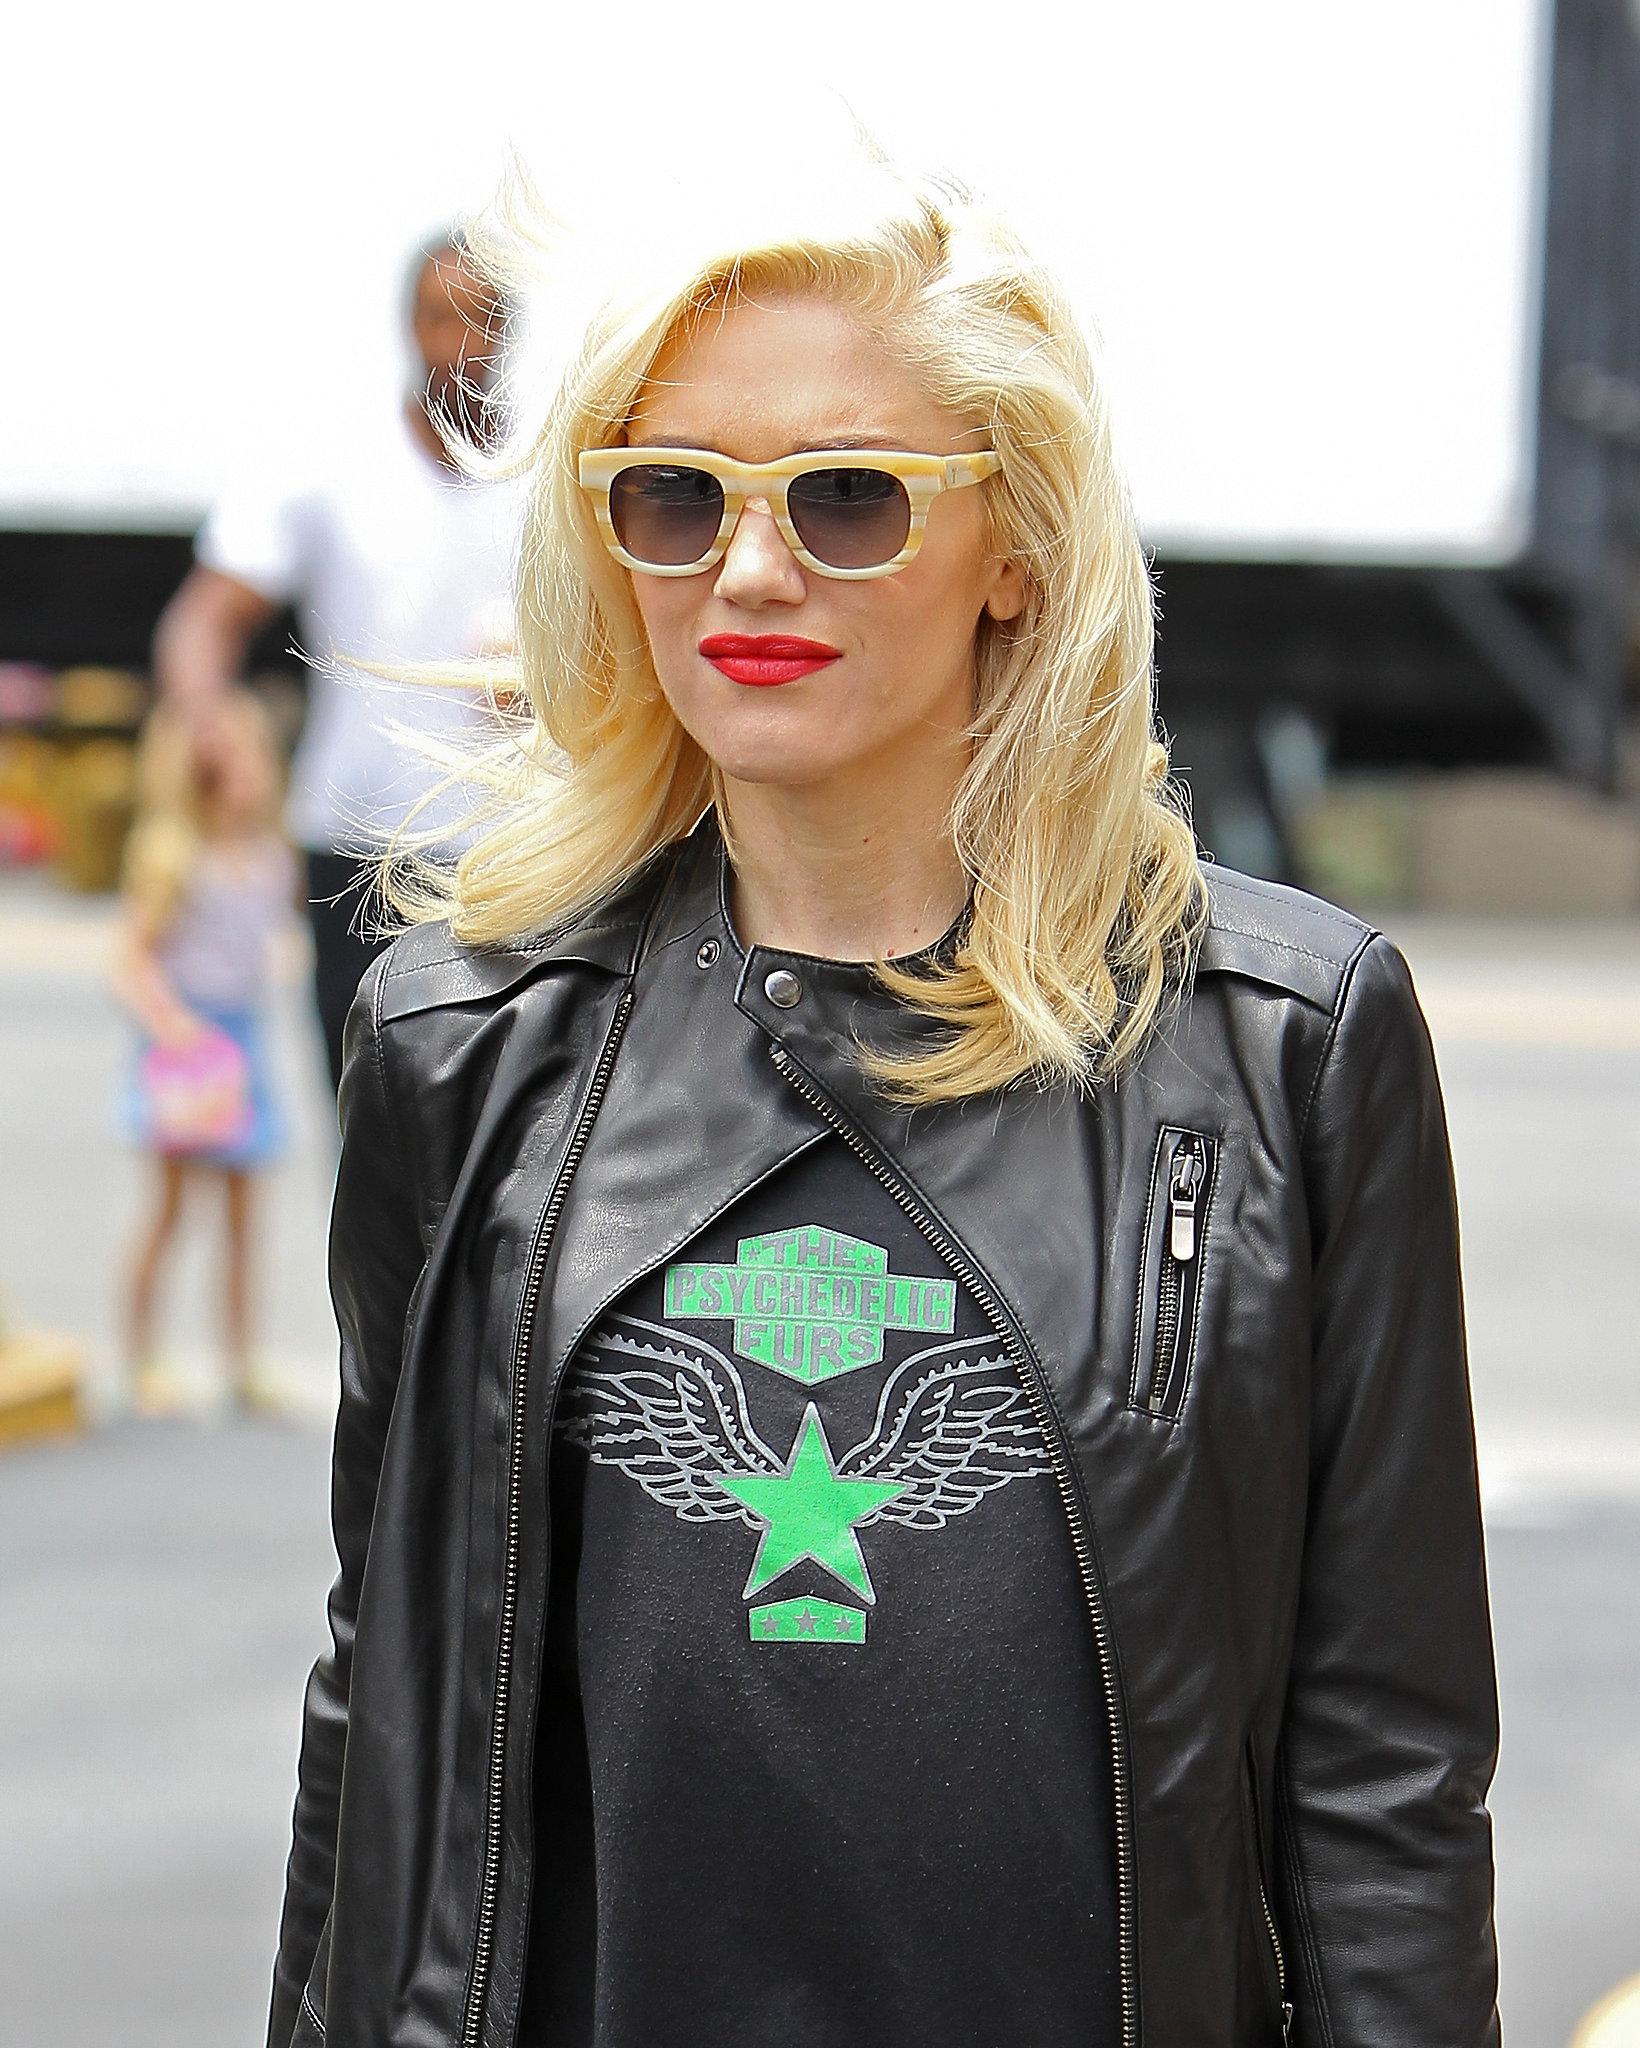 Gwen Stefani has the hip-lady waves on lockdown.